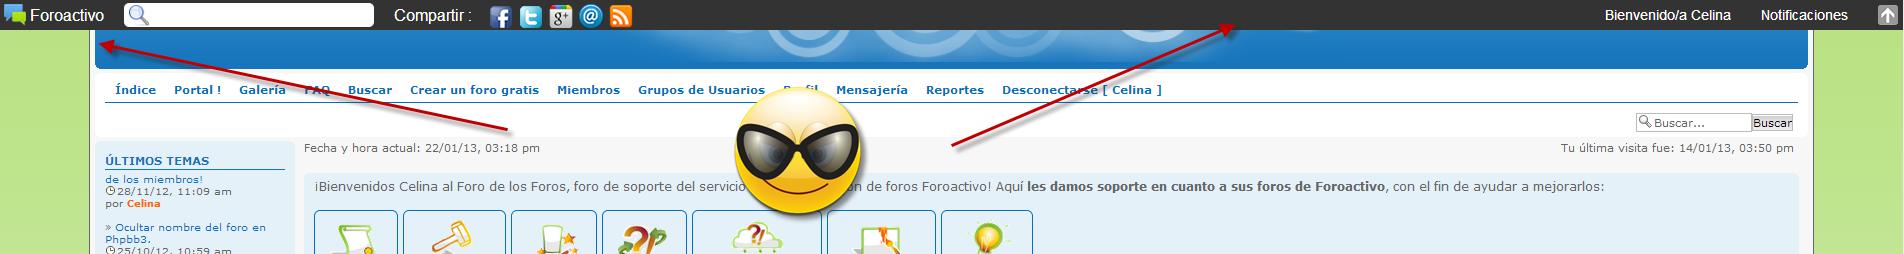 Foro gratis : Engancha-2 - Portal 40010